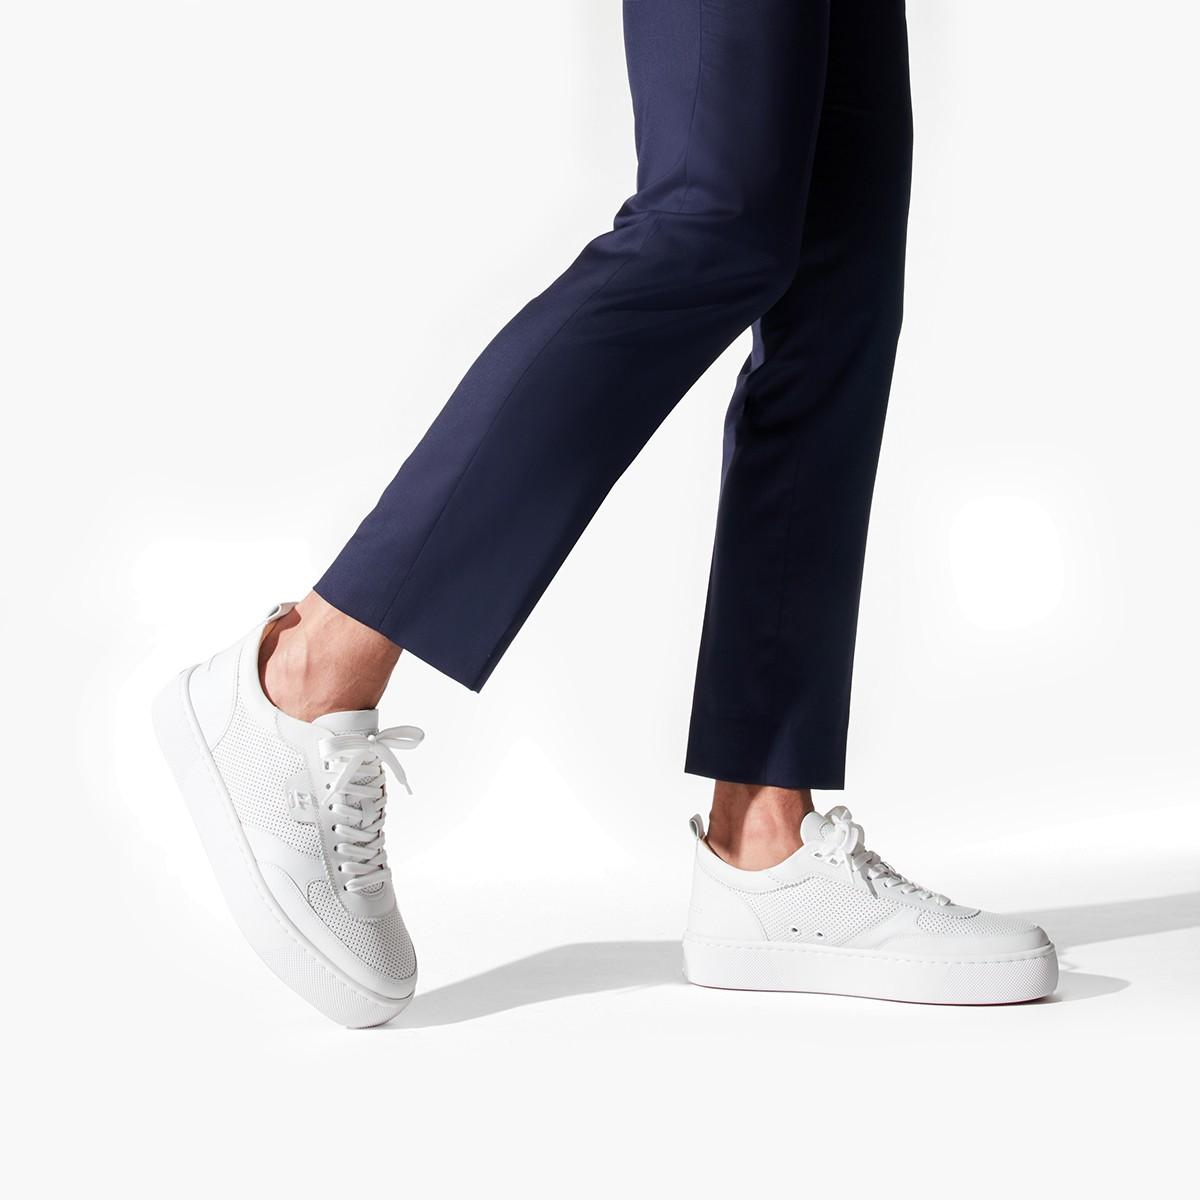 Shoes - Happyrui Flat - Christian Louboutin